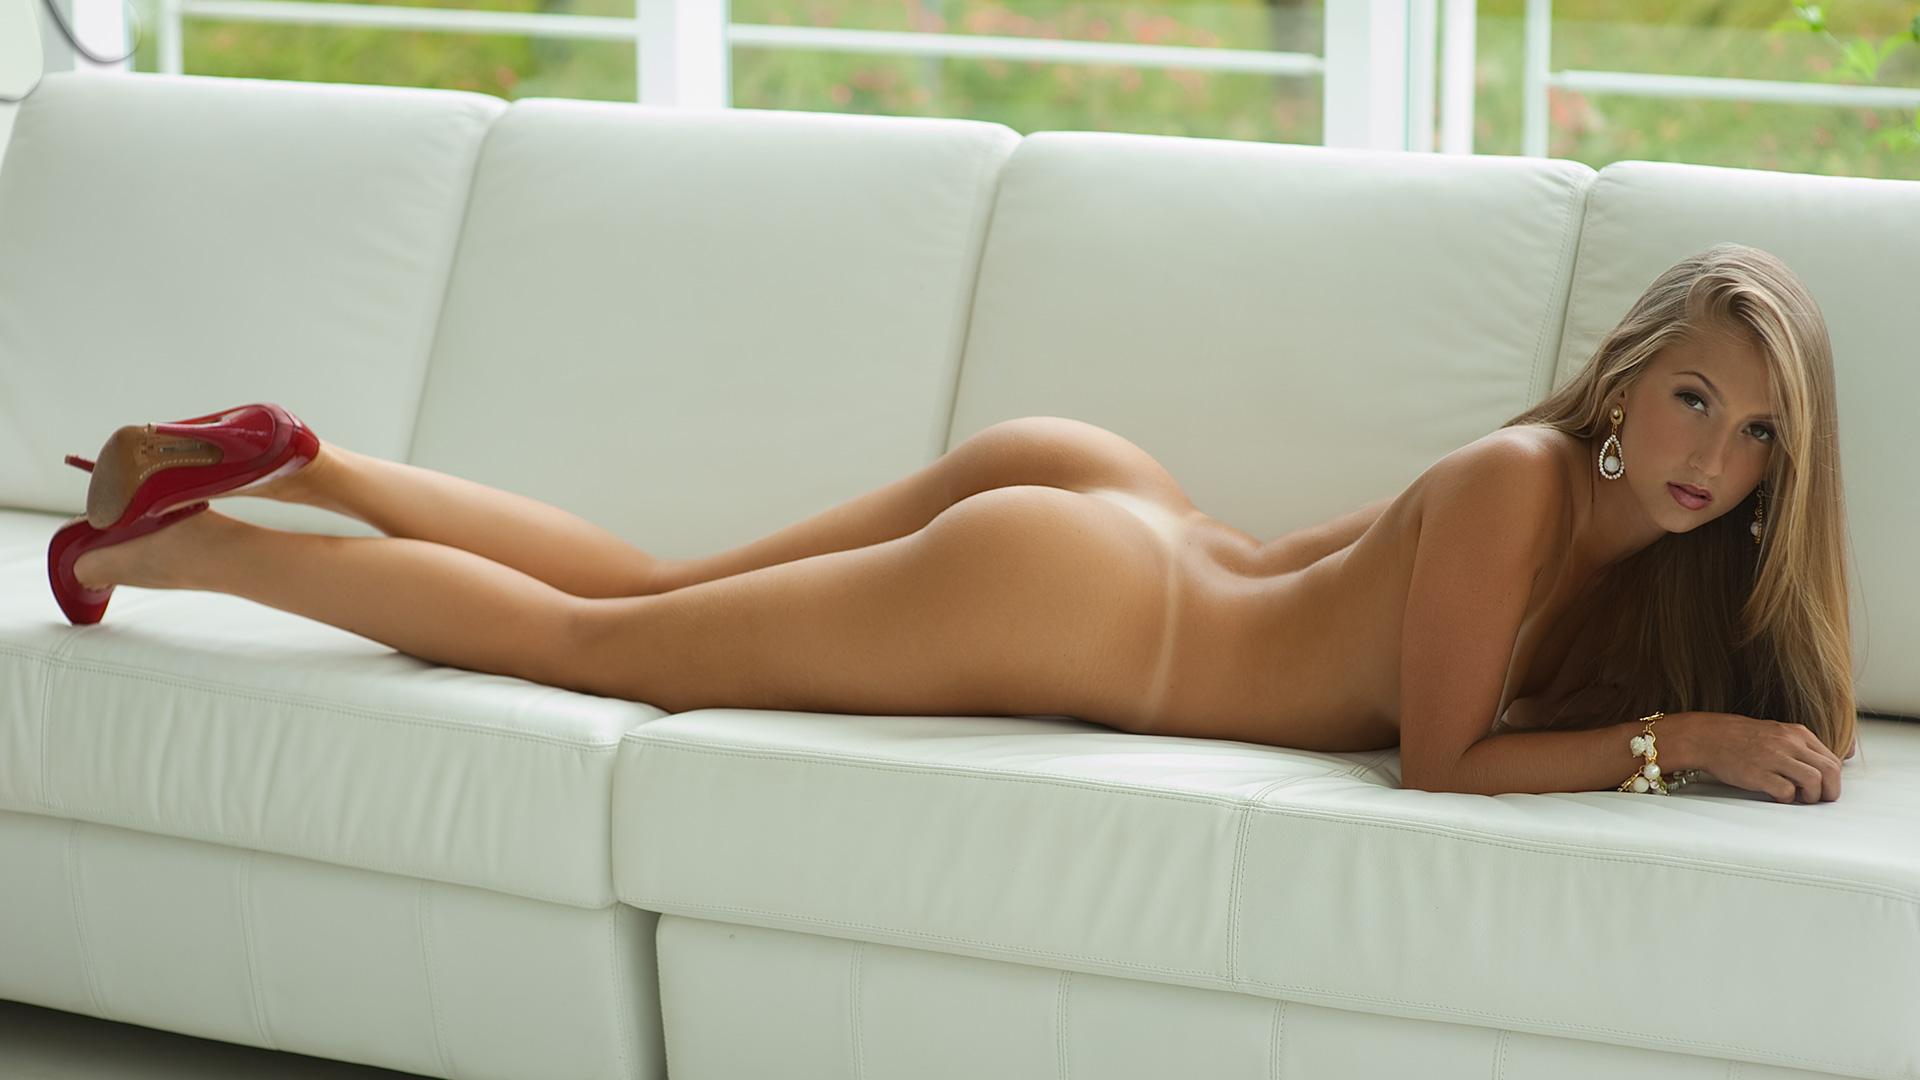 Wallpaper jana cova ass buttocks naked female couch